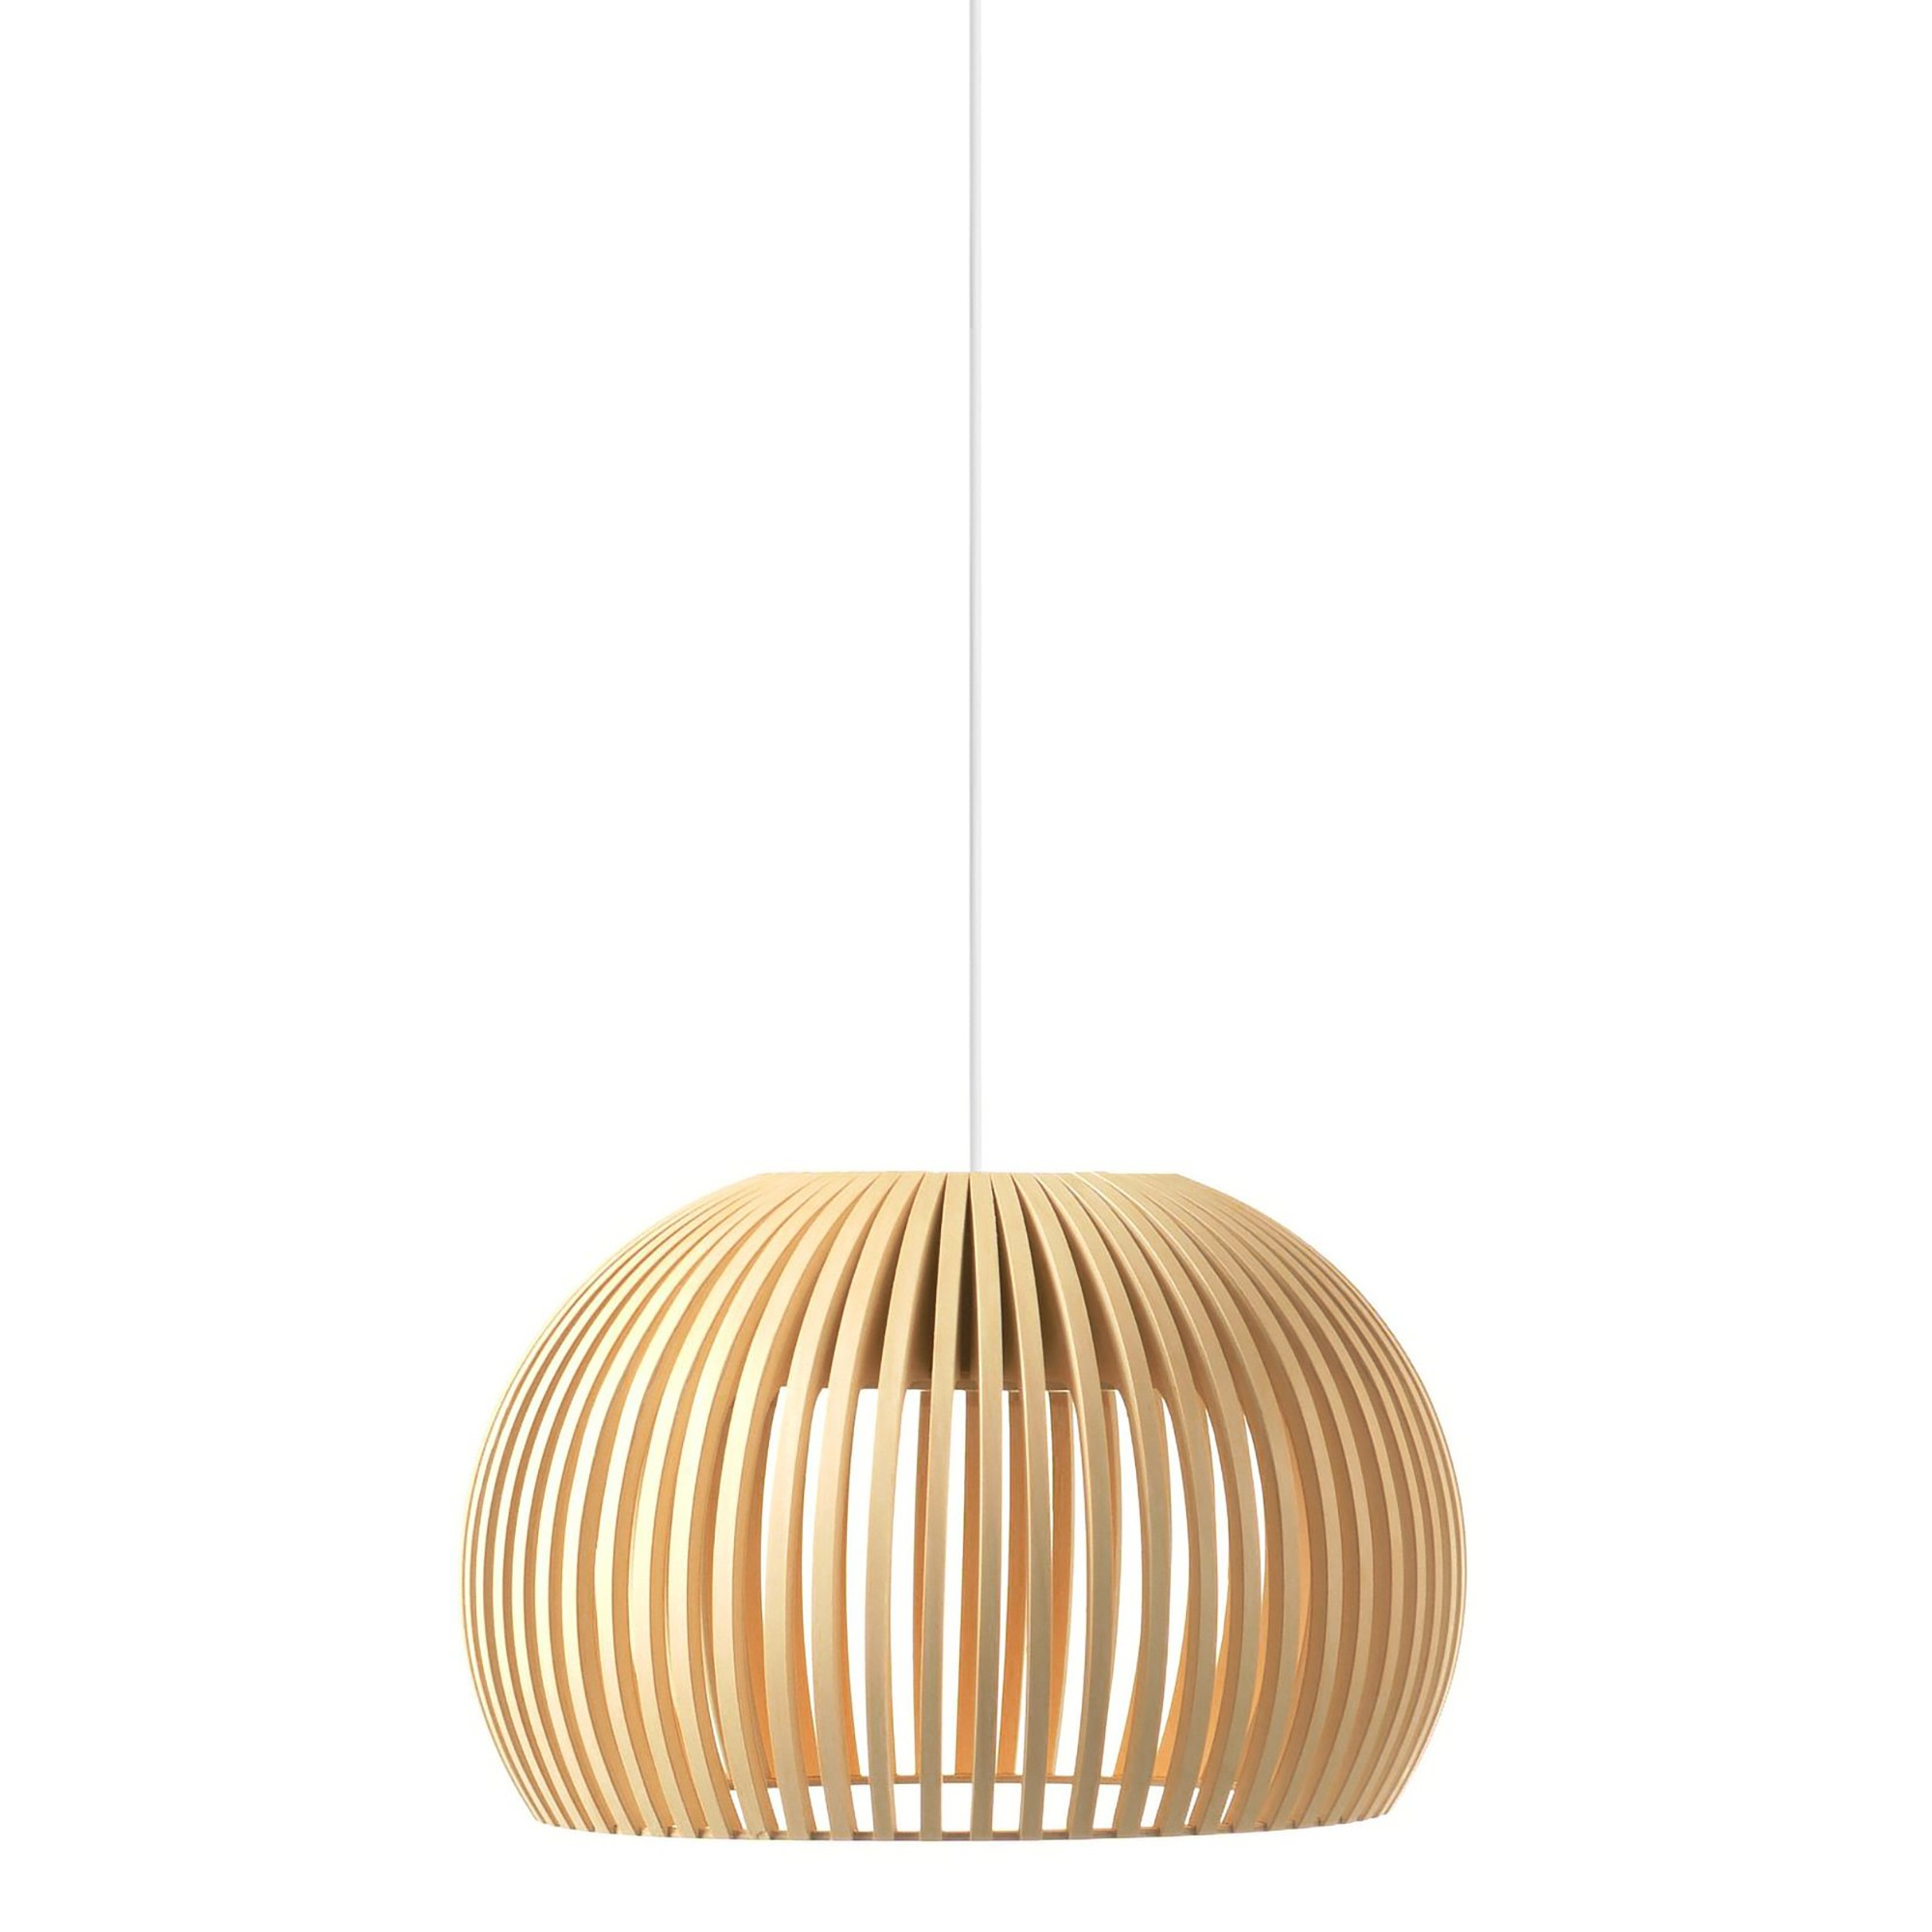 Replica Seppo Koho Atto Wooden Pendant Light, Natural